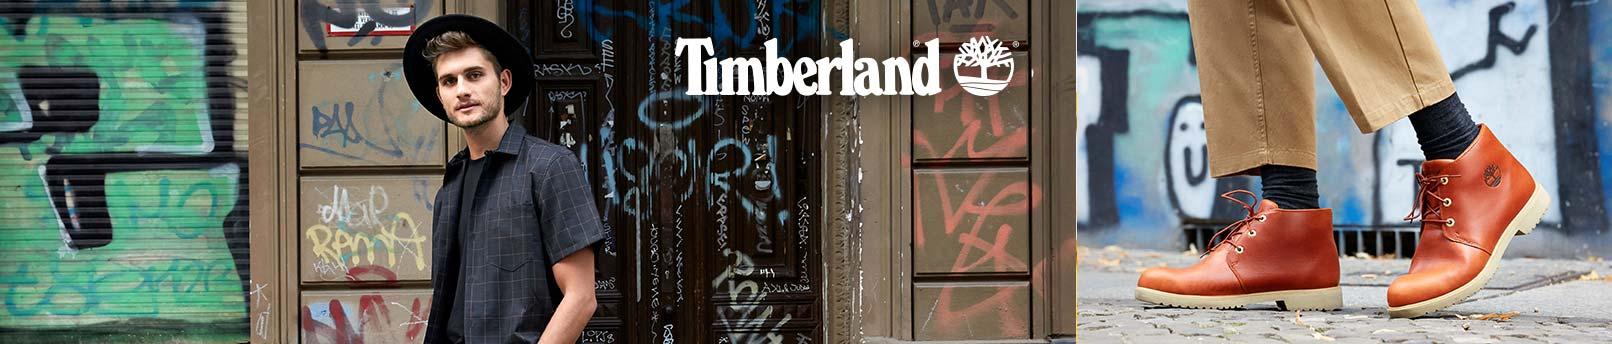 Découvrez Timberland